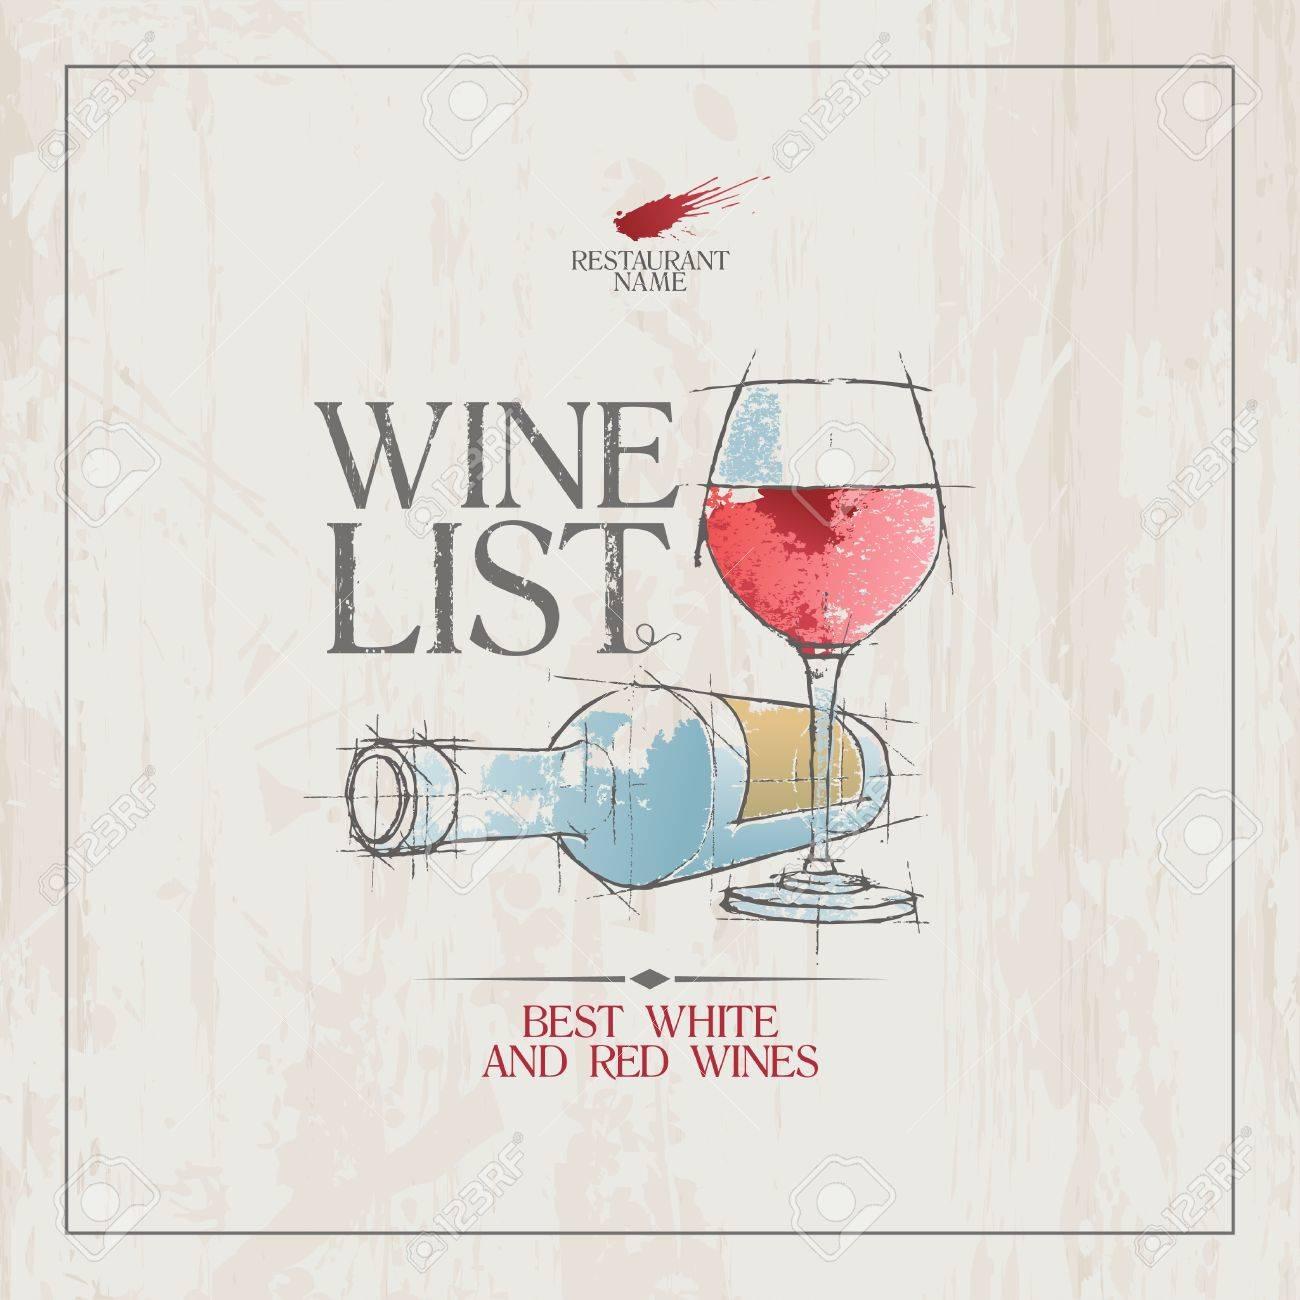 Wine List Menu Card Design Template Royalty Free Cliparts – Free Wine List Template